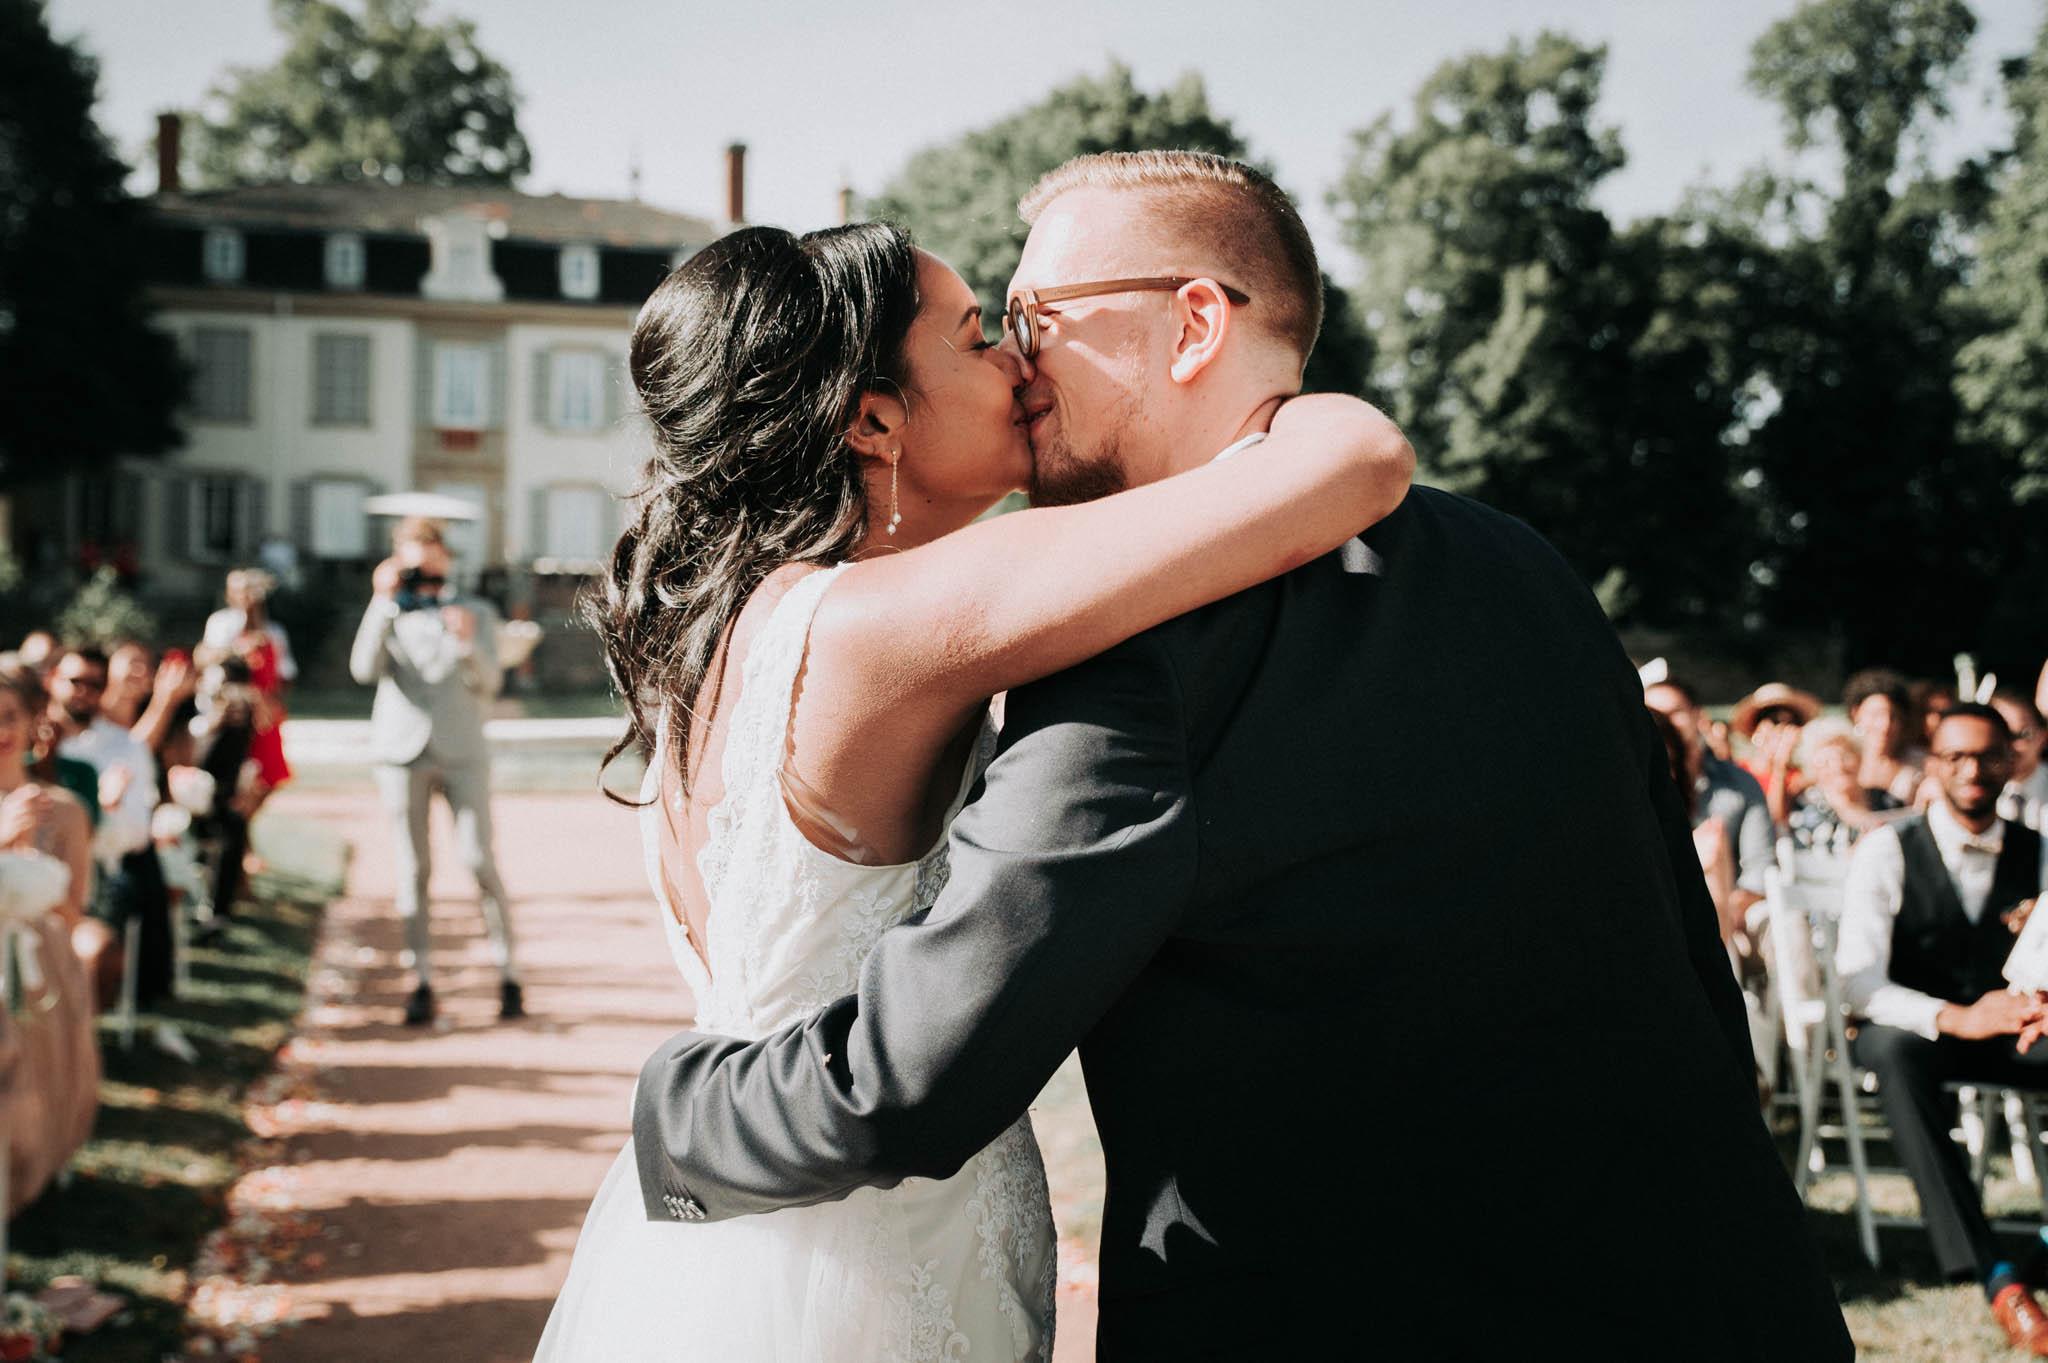 2017-07-15 - DSC_8247 - photographe - mariage - www.lauriediazwedding.com.jpg